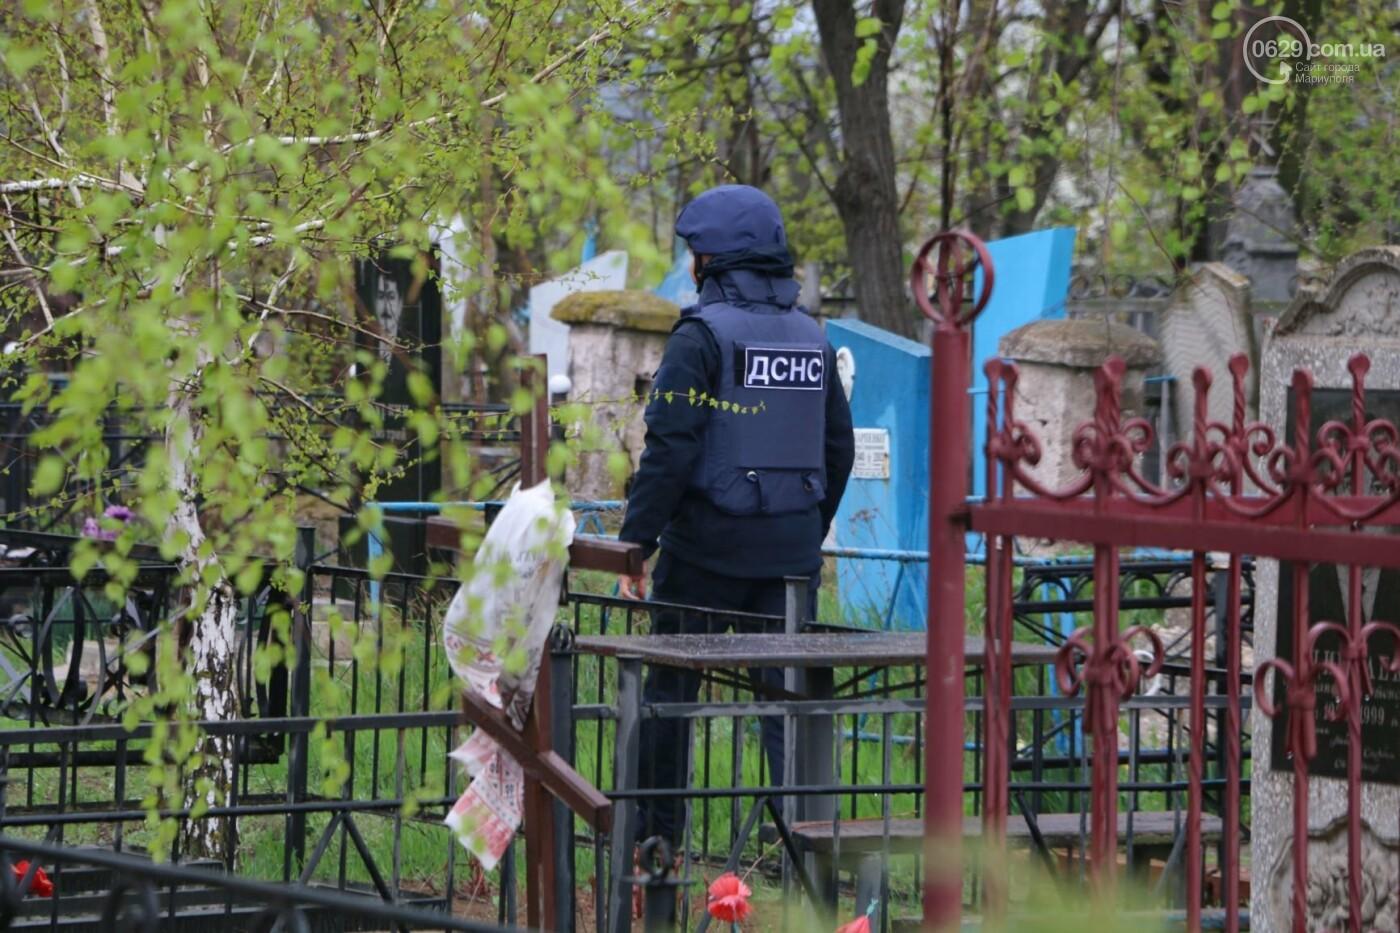 Пиротехники начали проверять безопасность кладбищ Мариуполя,- ФОТО, ВИДЕО, фото-3